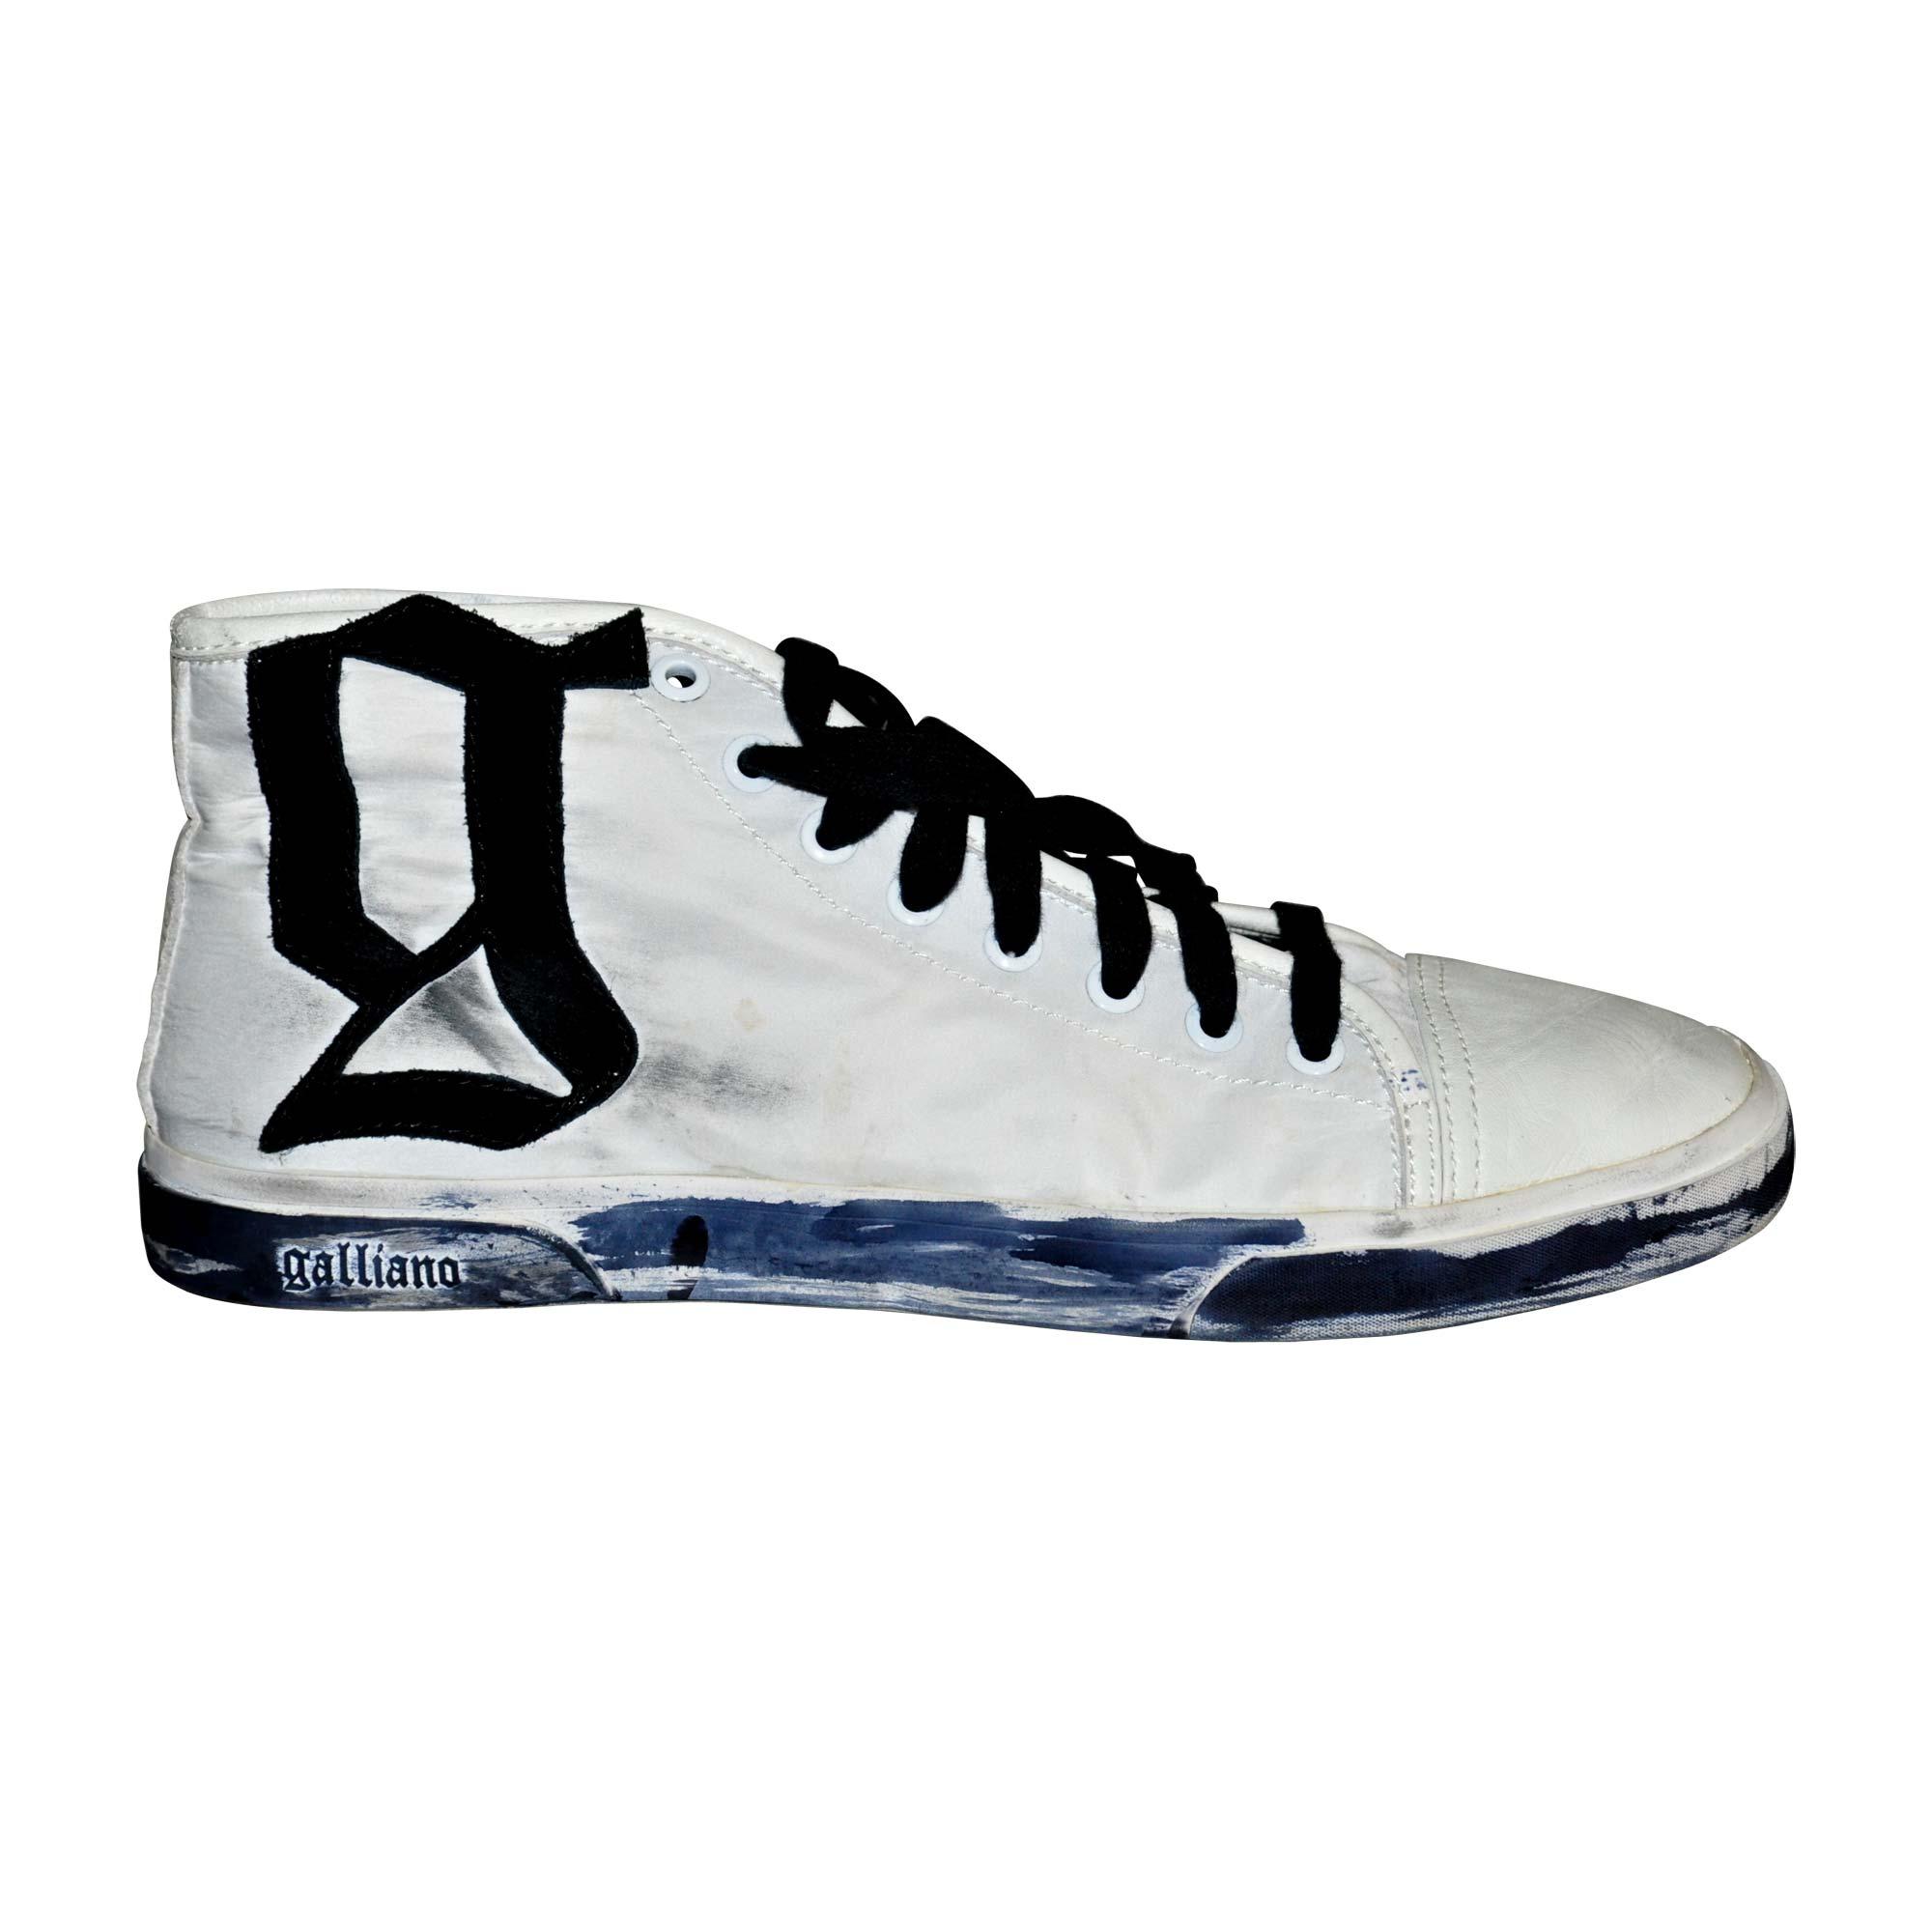 Galliano Blanc Chaussures Sport John 7660695 40 De W8qxBwzgx4